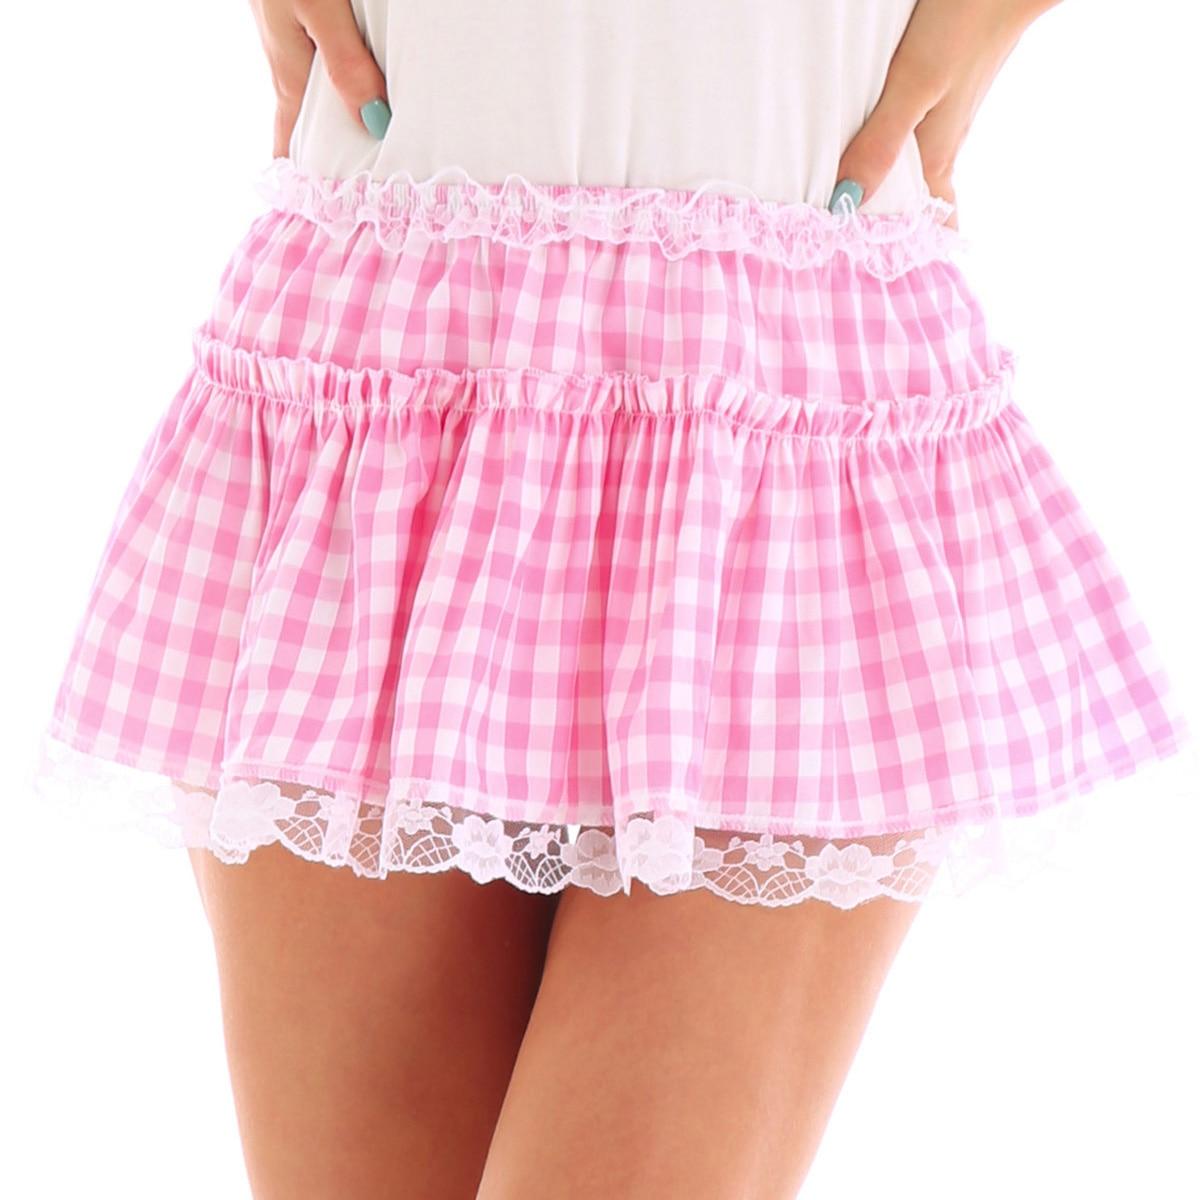 Unisex Men Women A-line Mini Skirt  Men Sexy Sissy Skirt Elastic Waistband Short Skirt With Lace Hem Pleated Gingham Roleplay